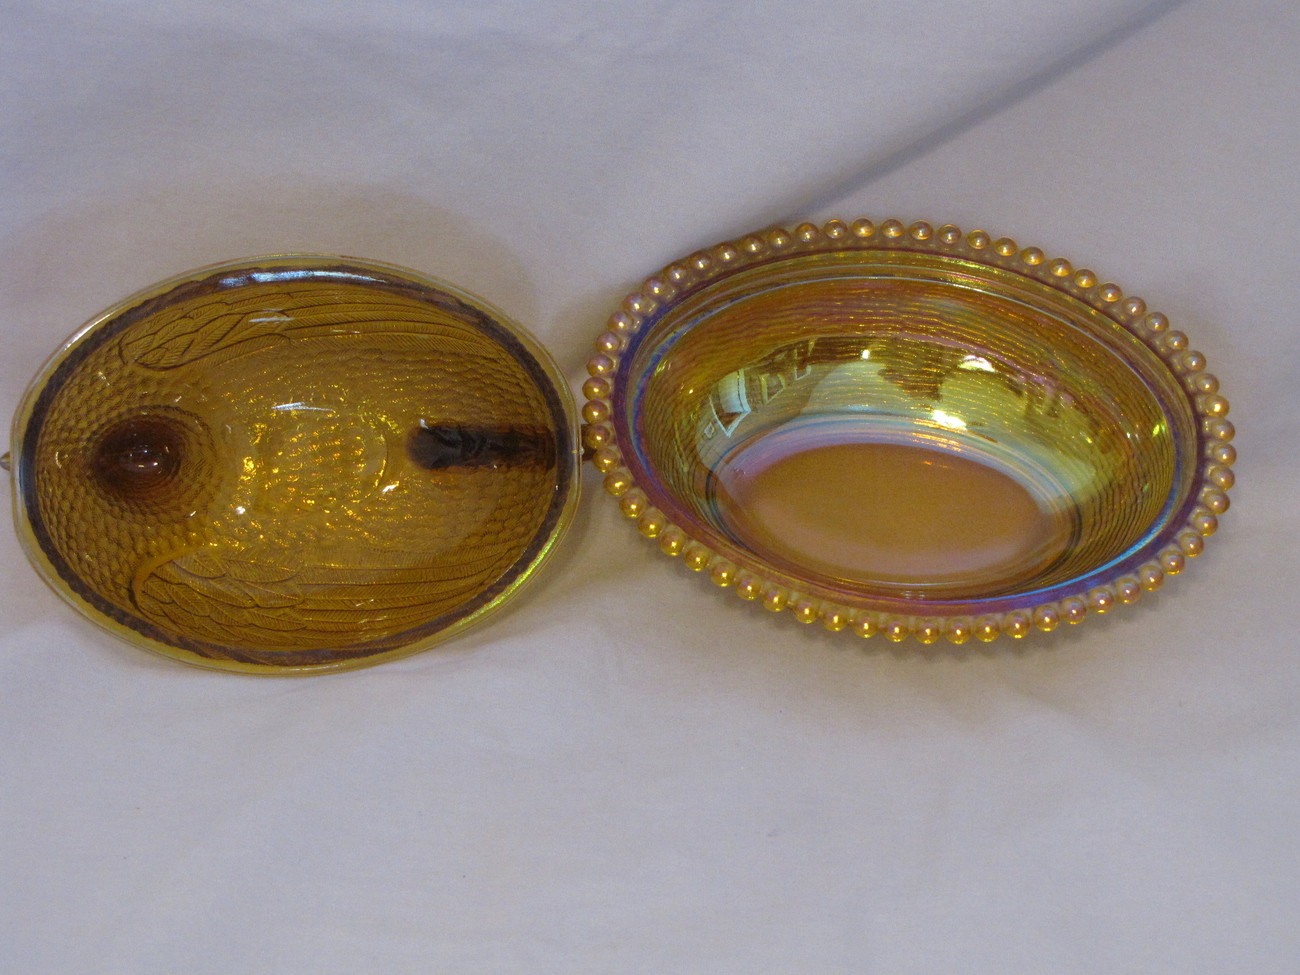 Vintage Nesting Hen Candy Dish